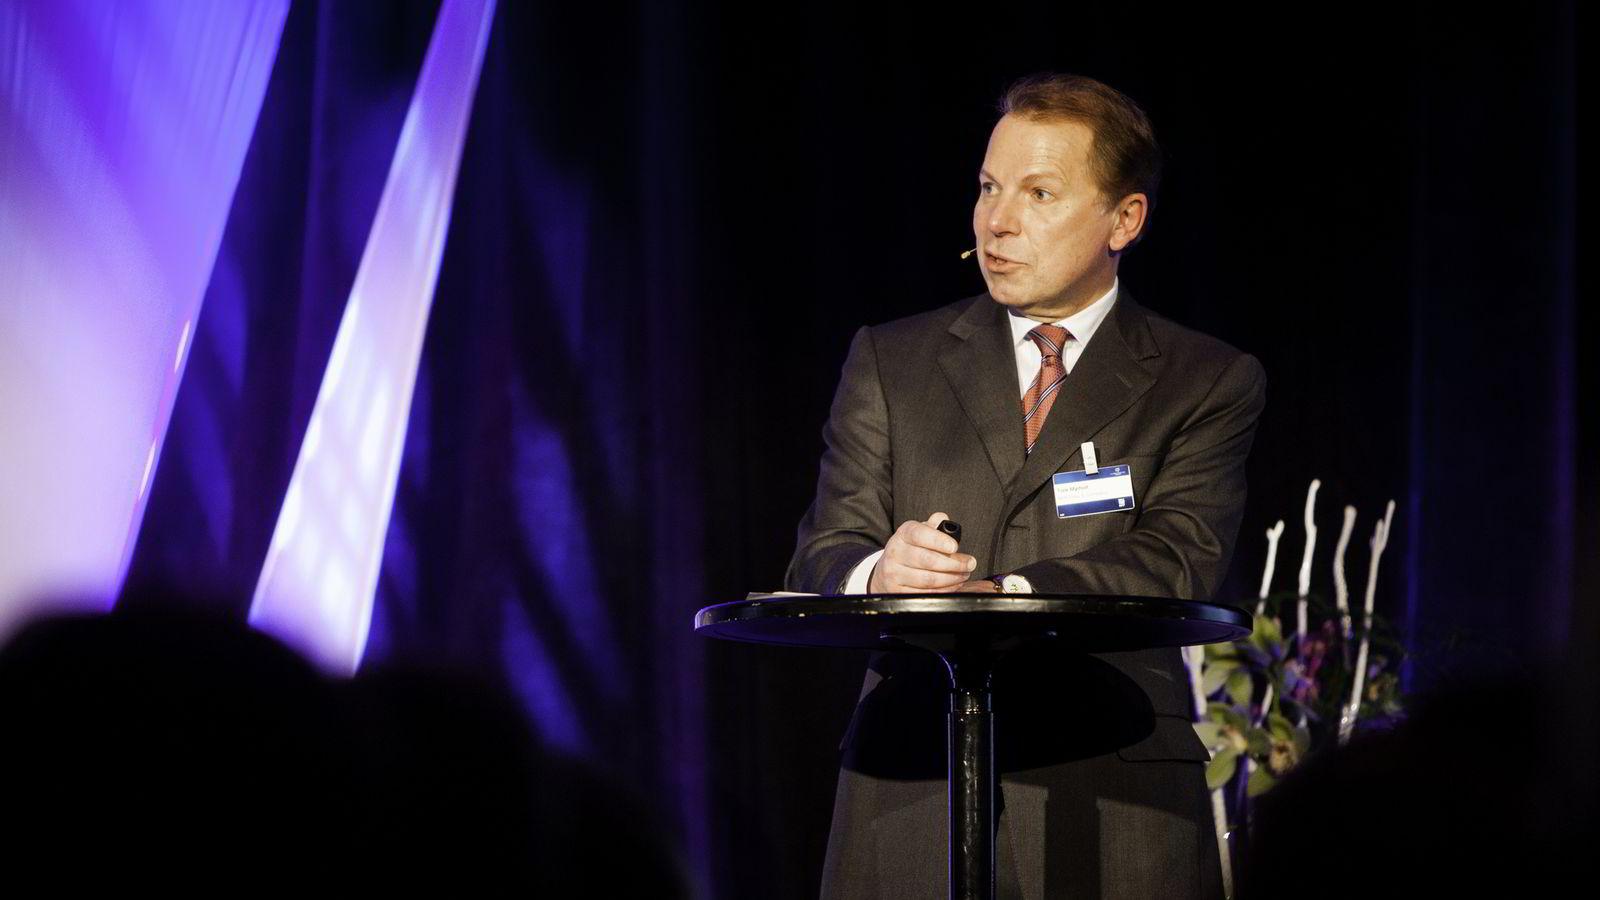 Partner Tore Myrholt i McKinsey & Company tjente 59 millioner kroner ifjor på kunder innen olje, gass og offshore.